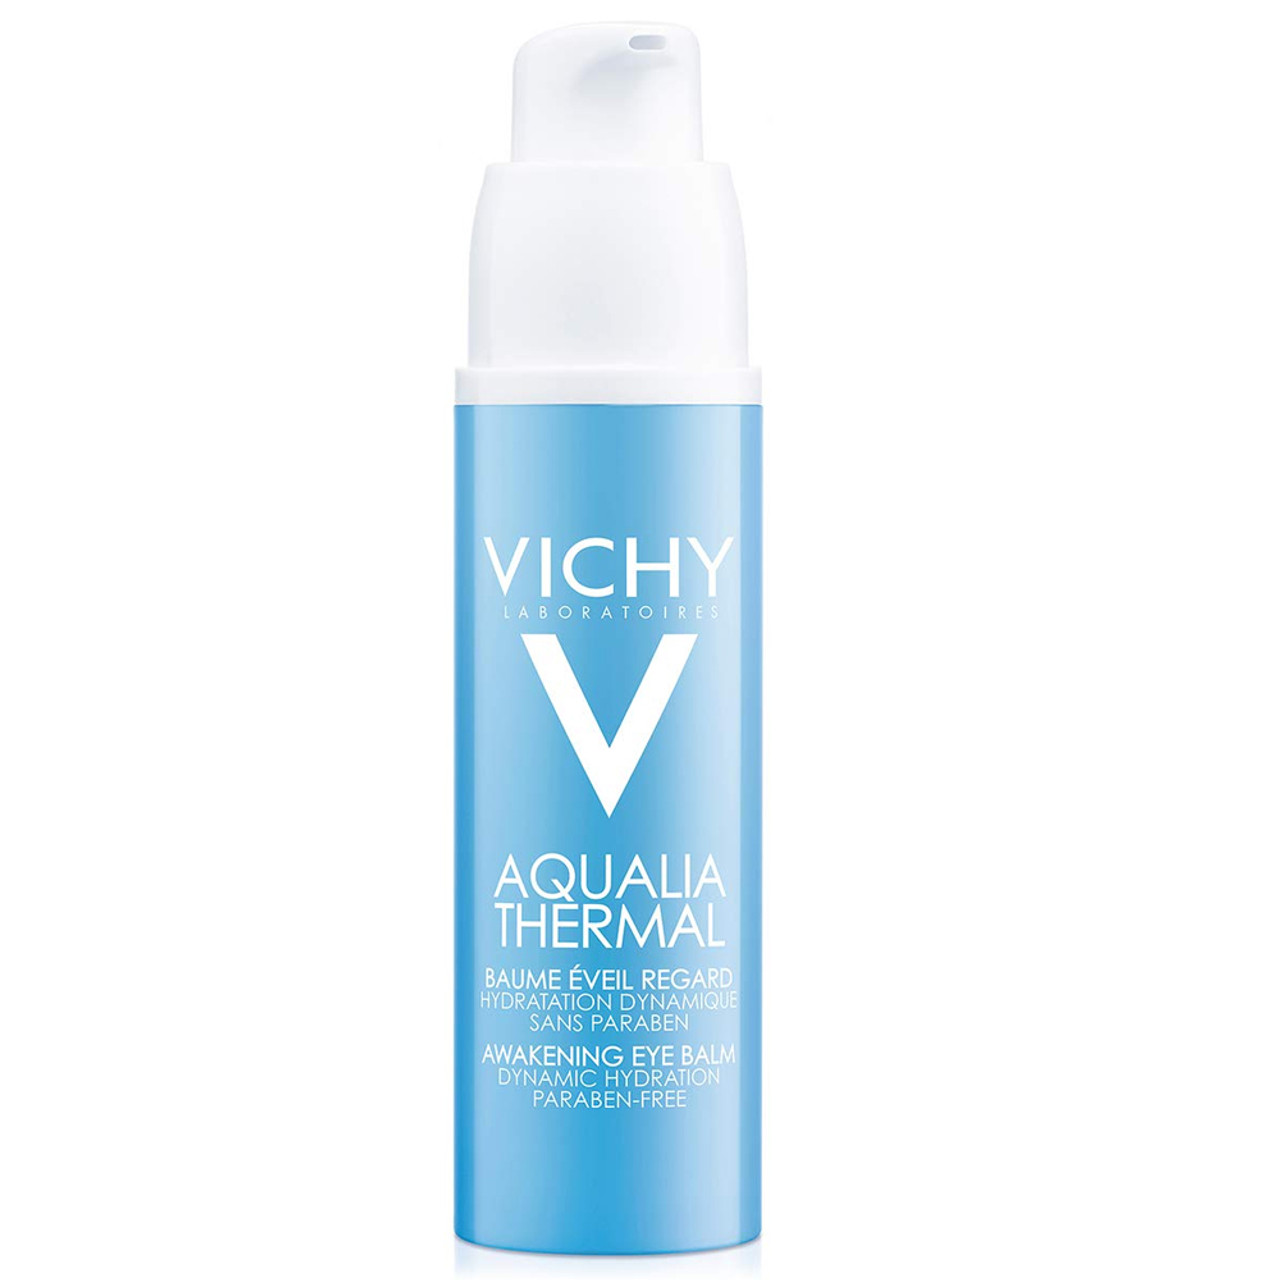 Vichy Aqualia Thermal Awakening Eye Balm